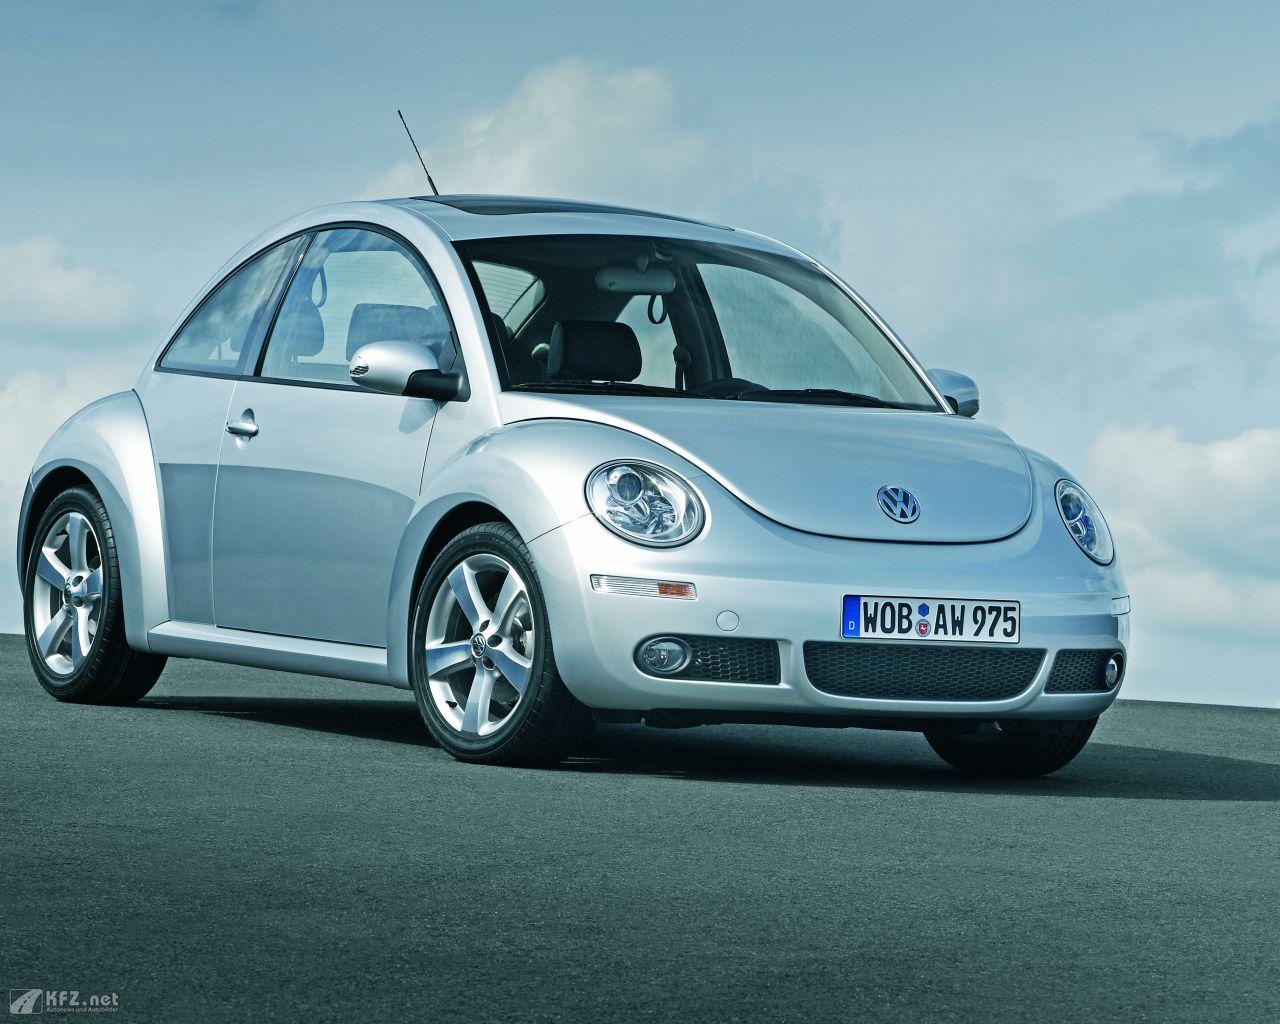 vw-beetle-1280x1024-2